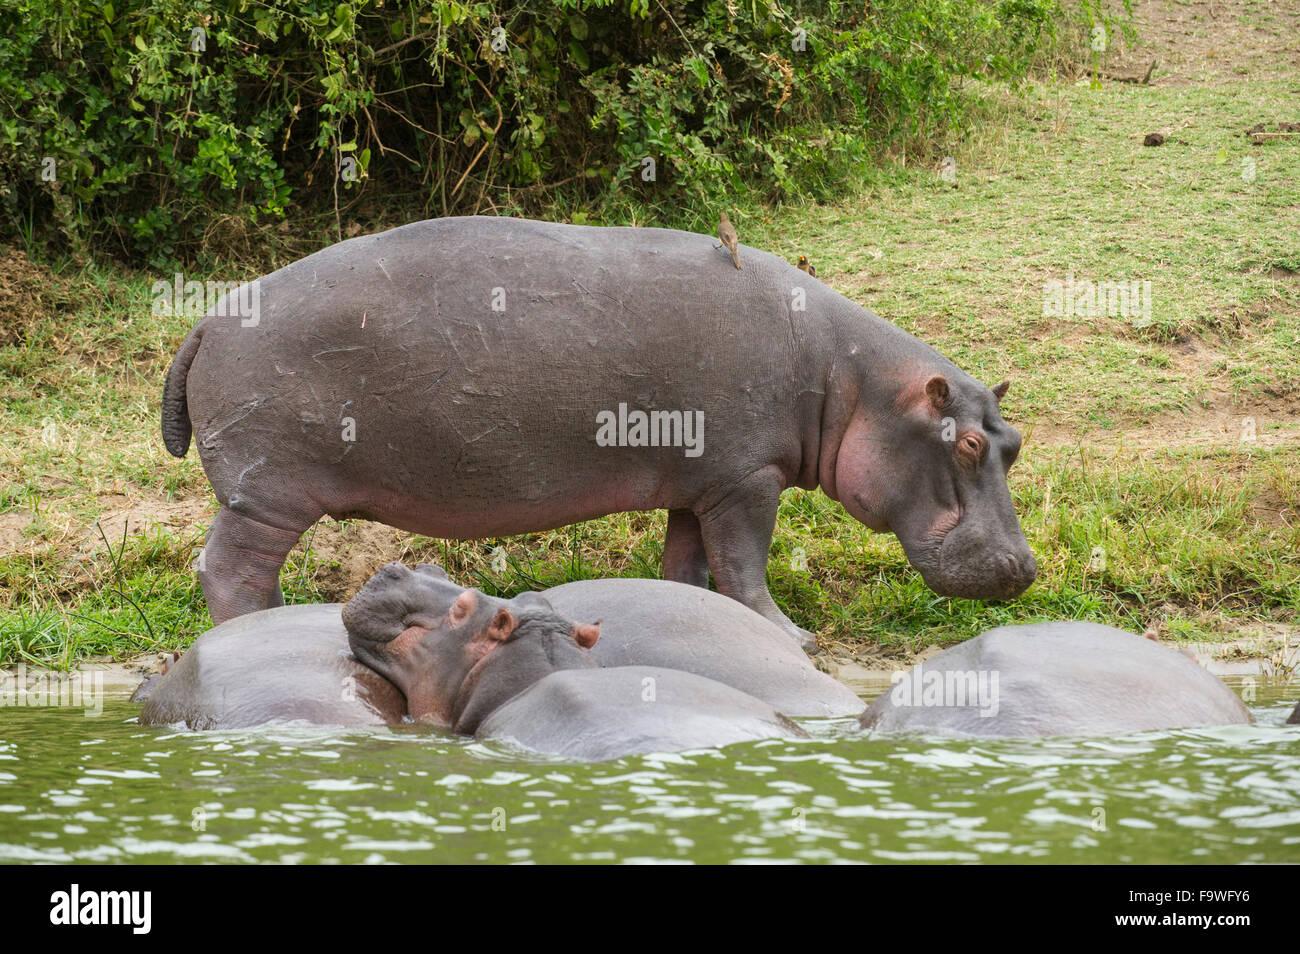 Hippopotamus (Hippopotamus amphibius) on the Kazinga Channel, Queen Elizabeth National Park, Uganda - Stock Image